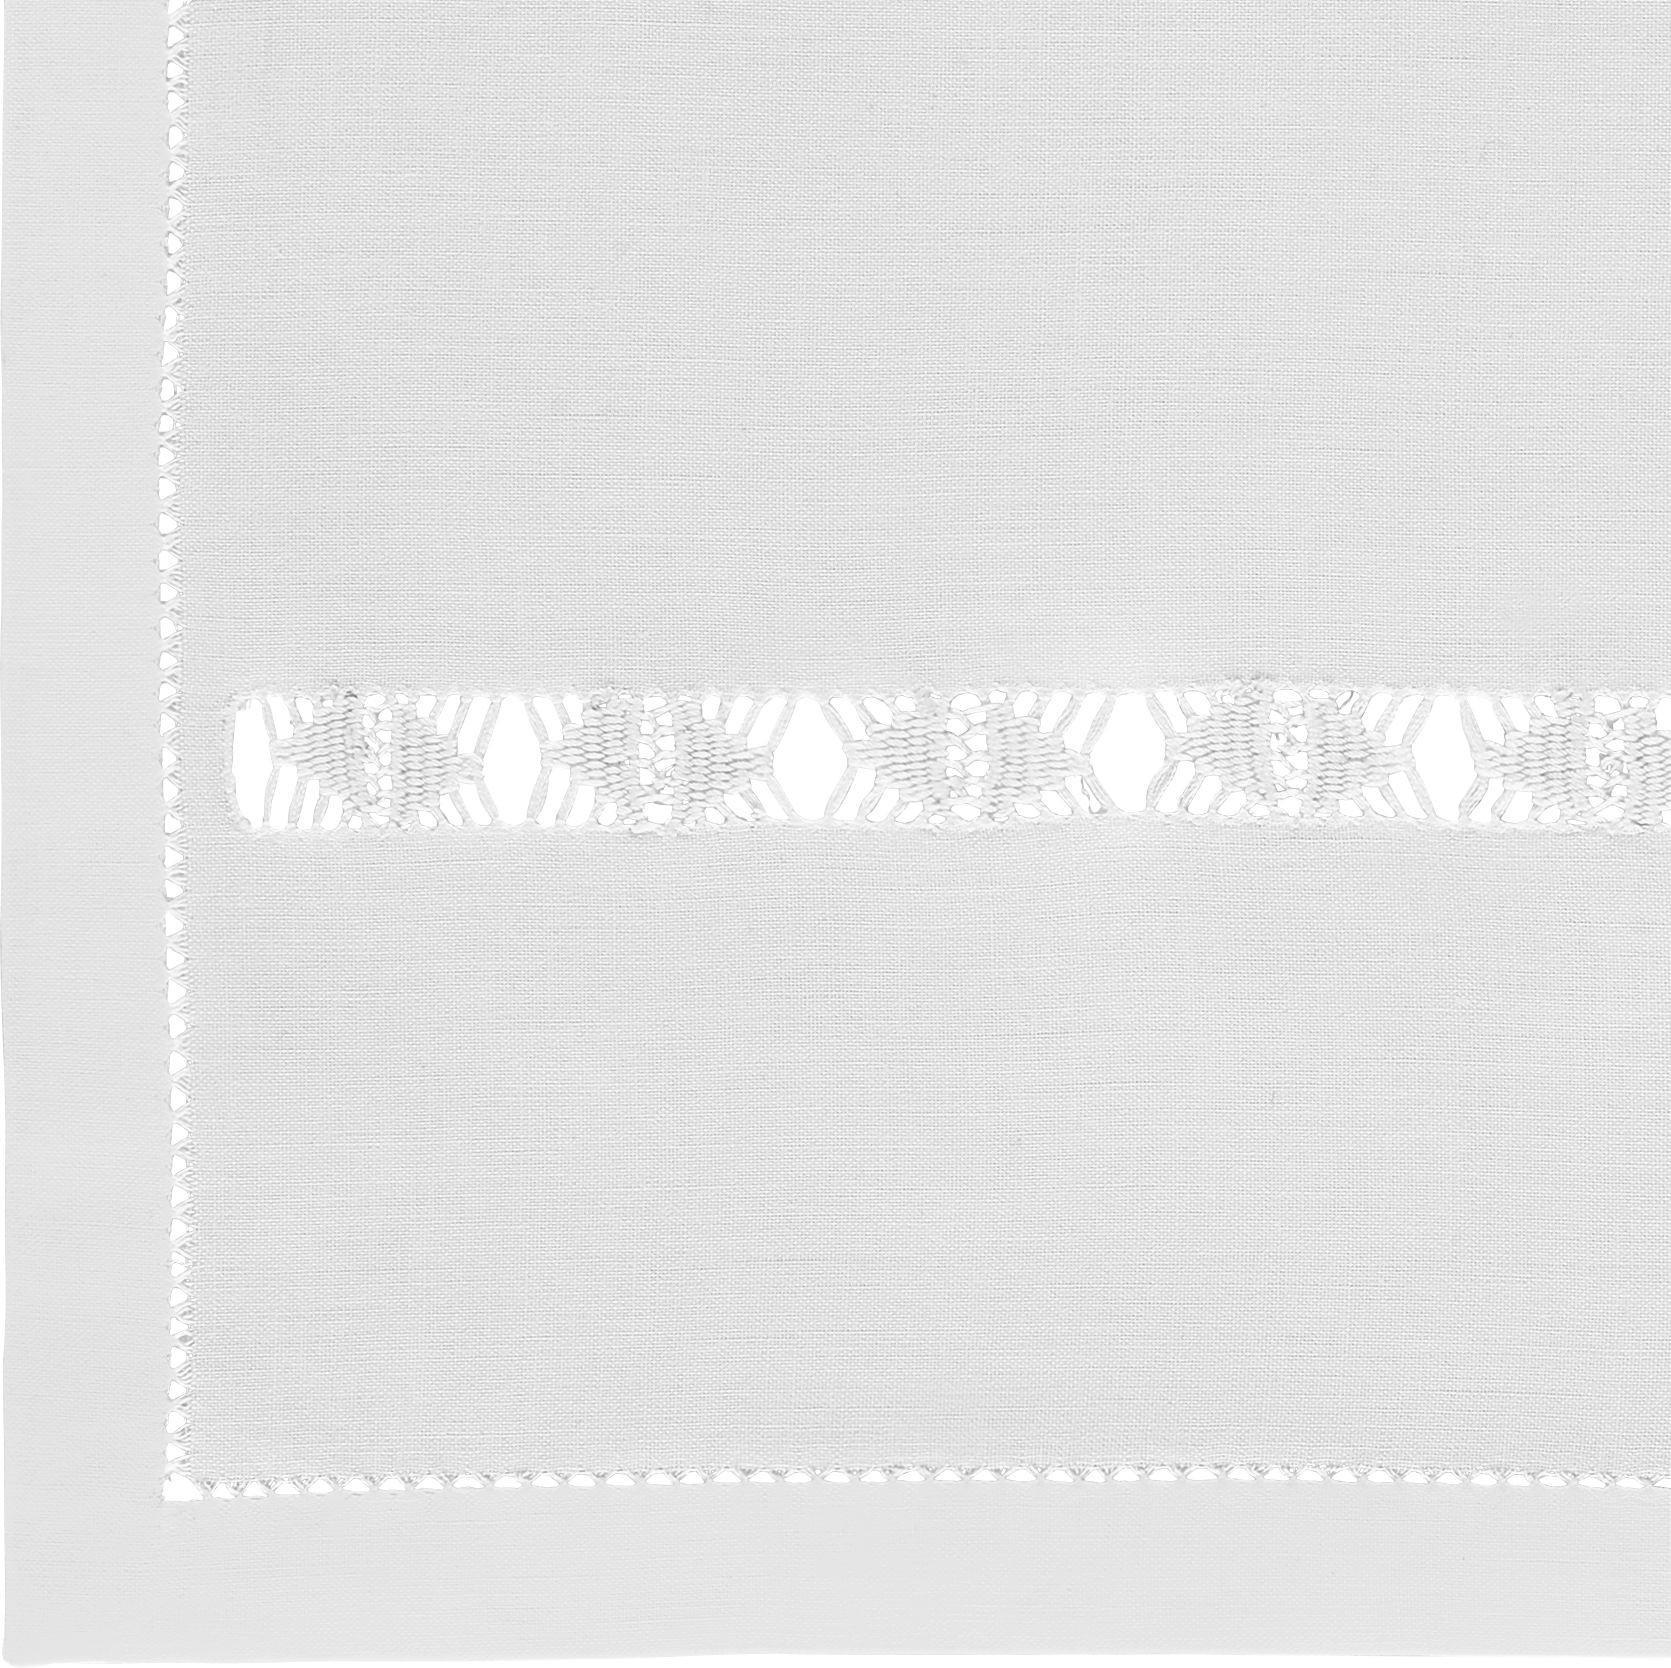 Tischset Mona 40x40cm - Weiß, ROMANTIK / LANDHAUS, Textil (40/40cm) - MÖMAX modern living